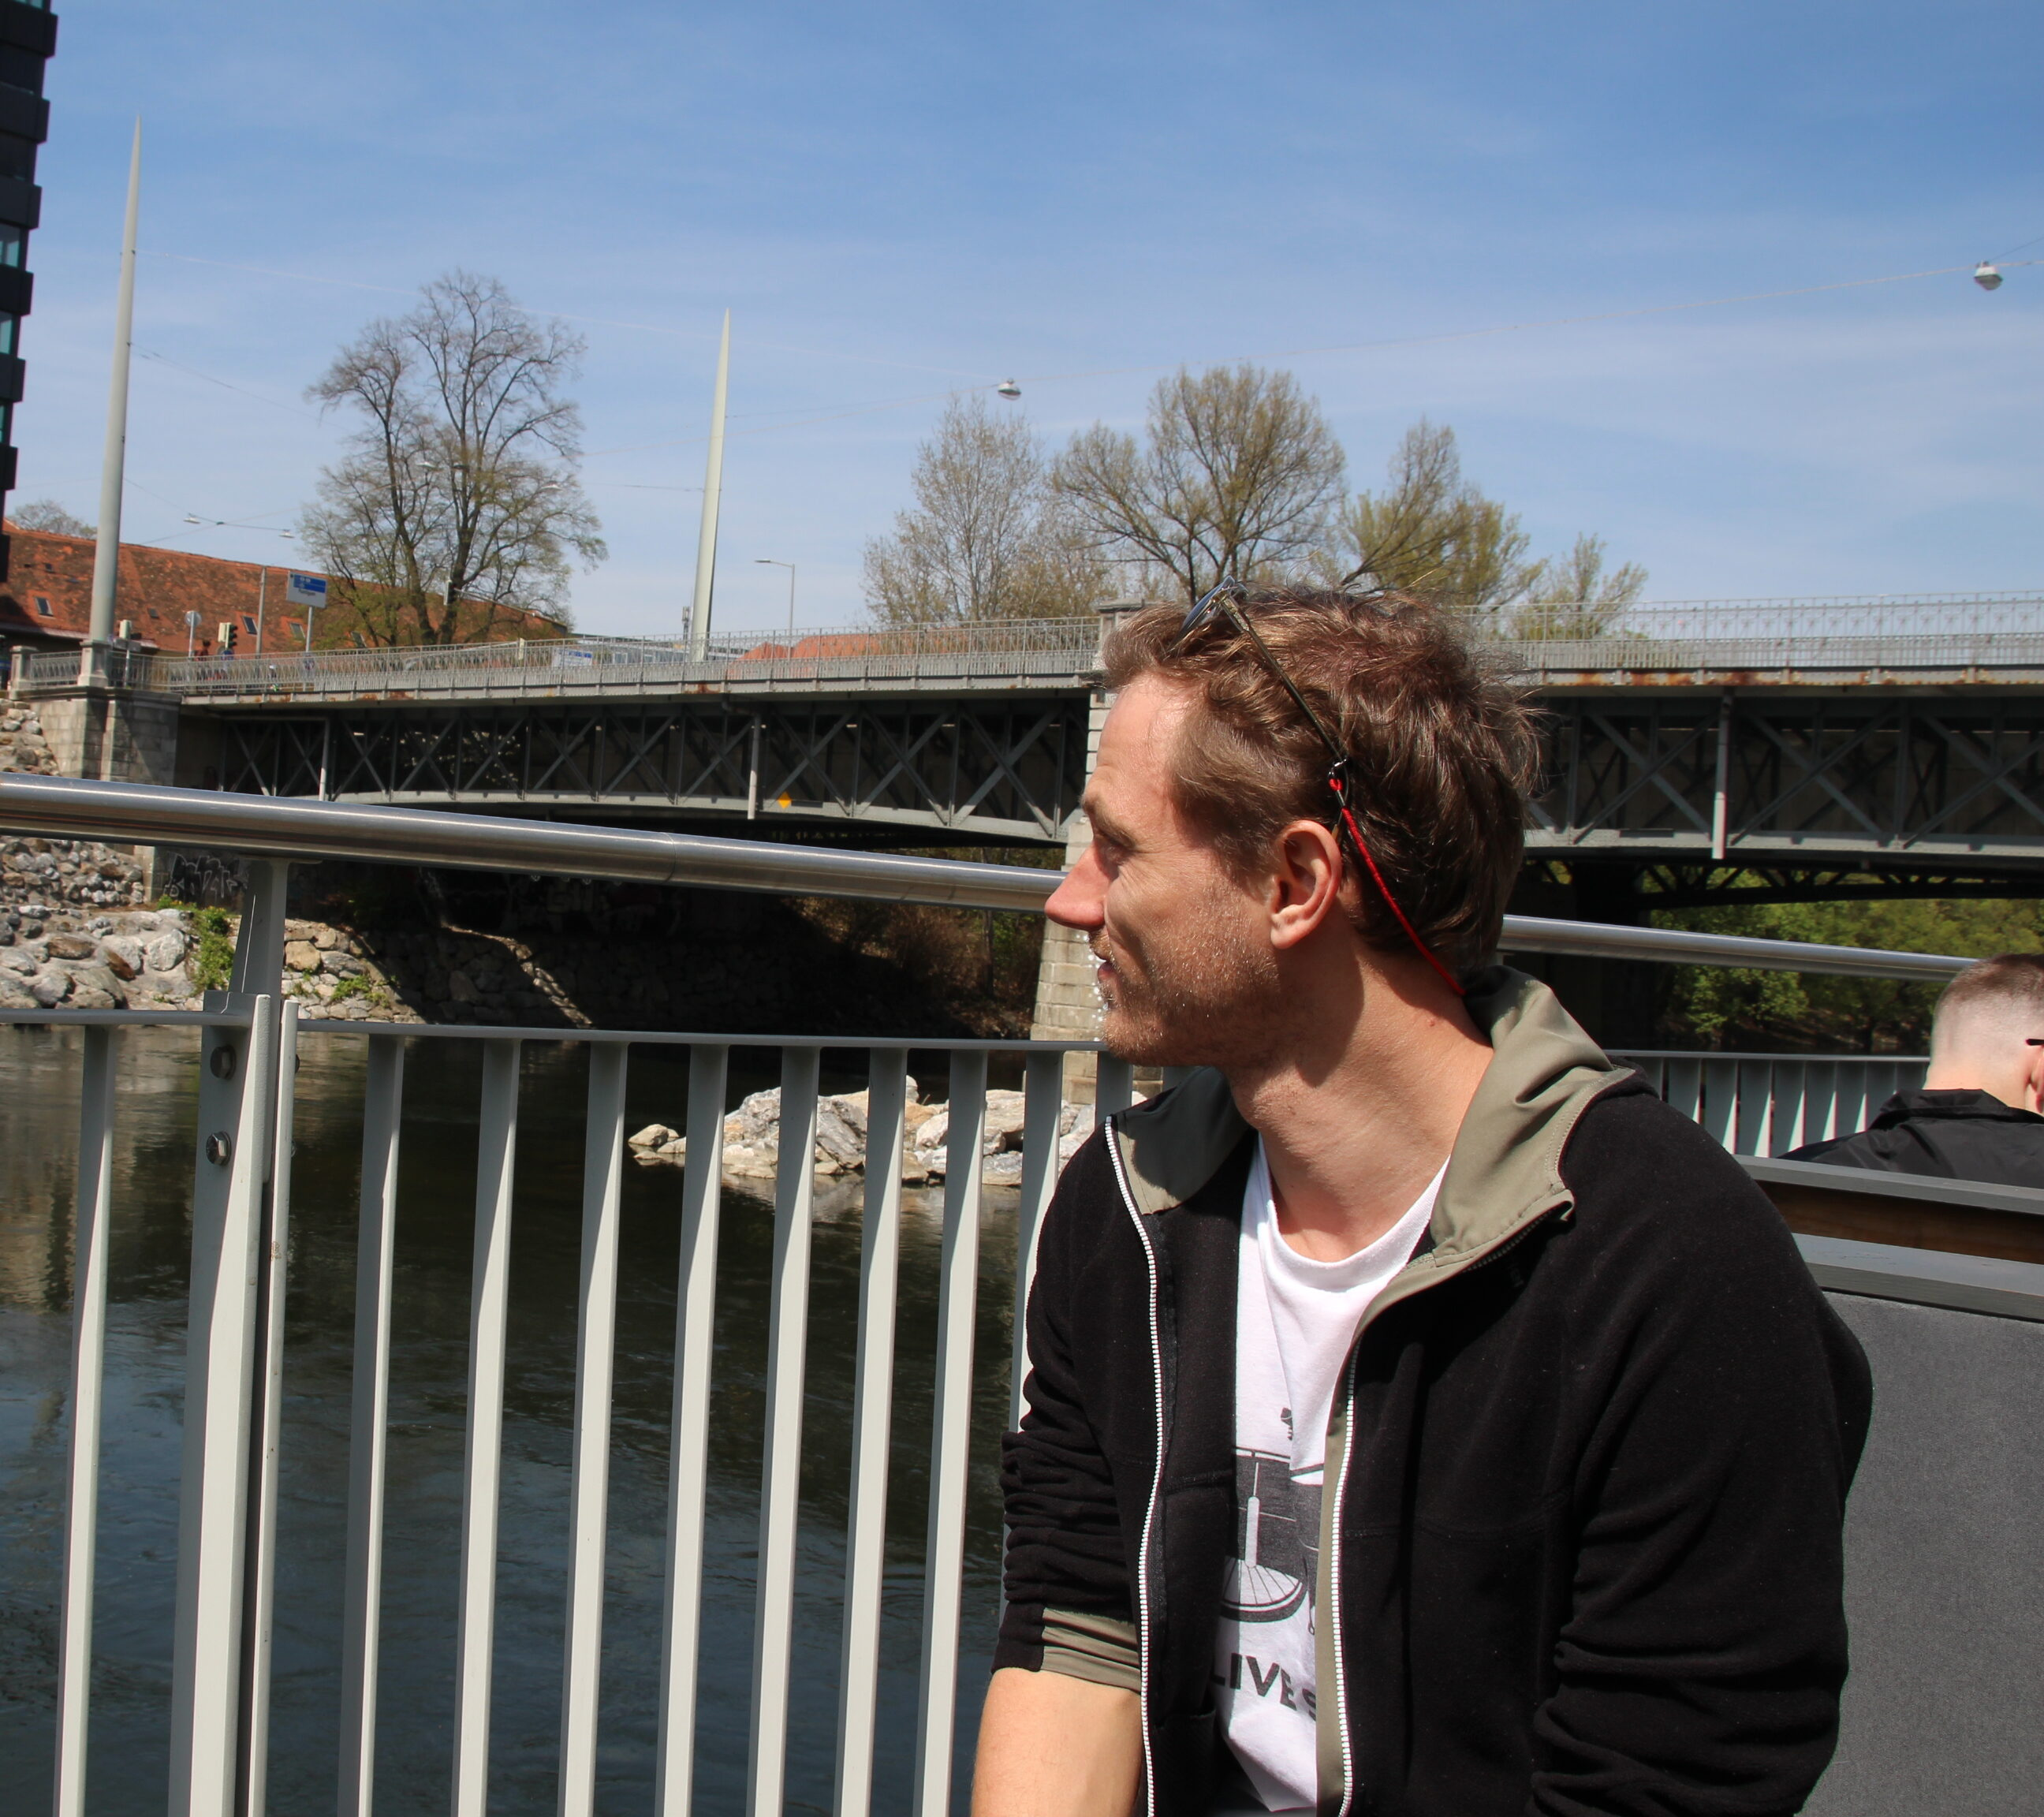 Malwin Haas, Program Manager im Bereich E-Mobilität, im Interview